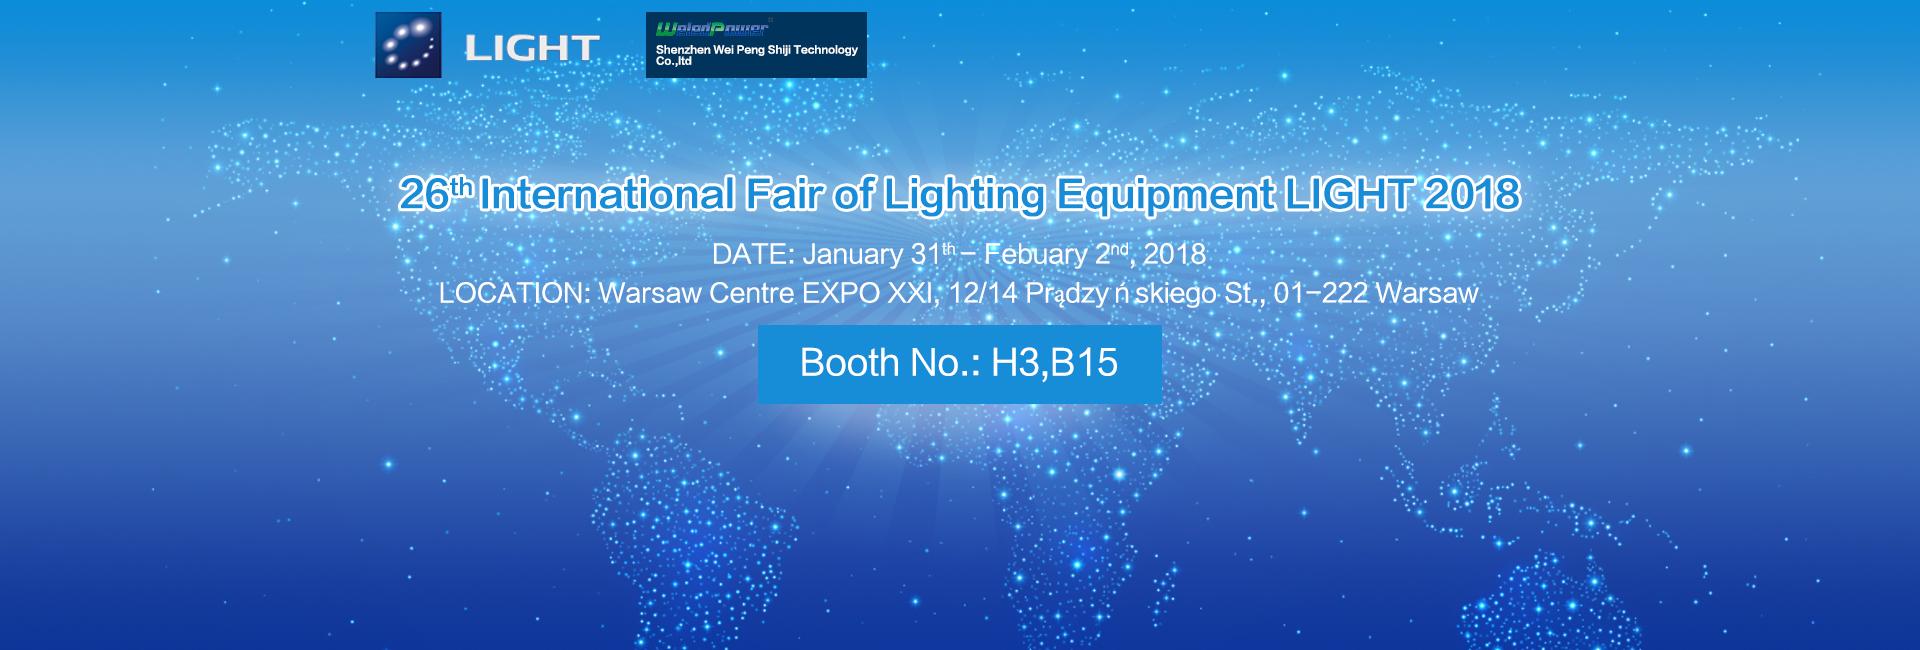 26th International Fair of Lighting Equipment LIGH